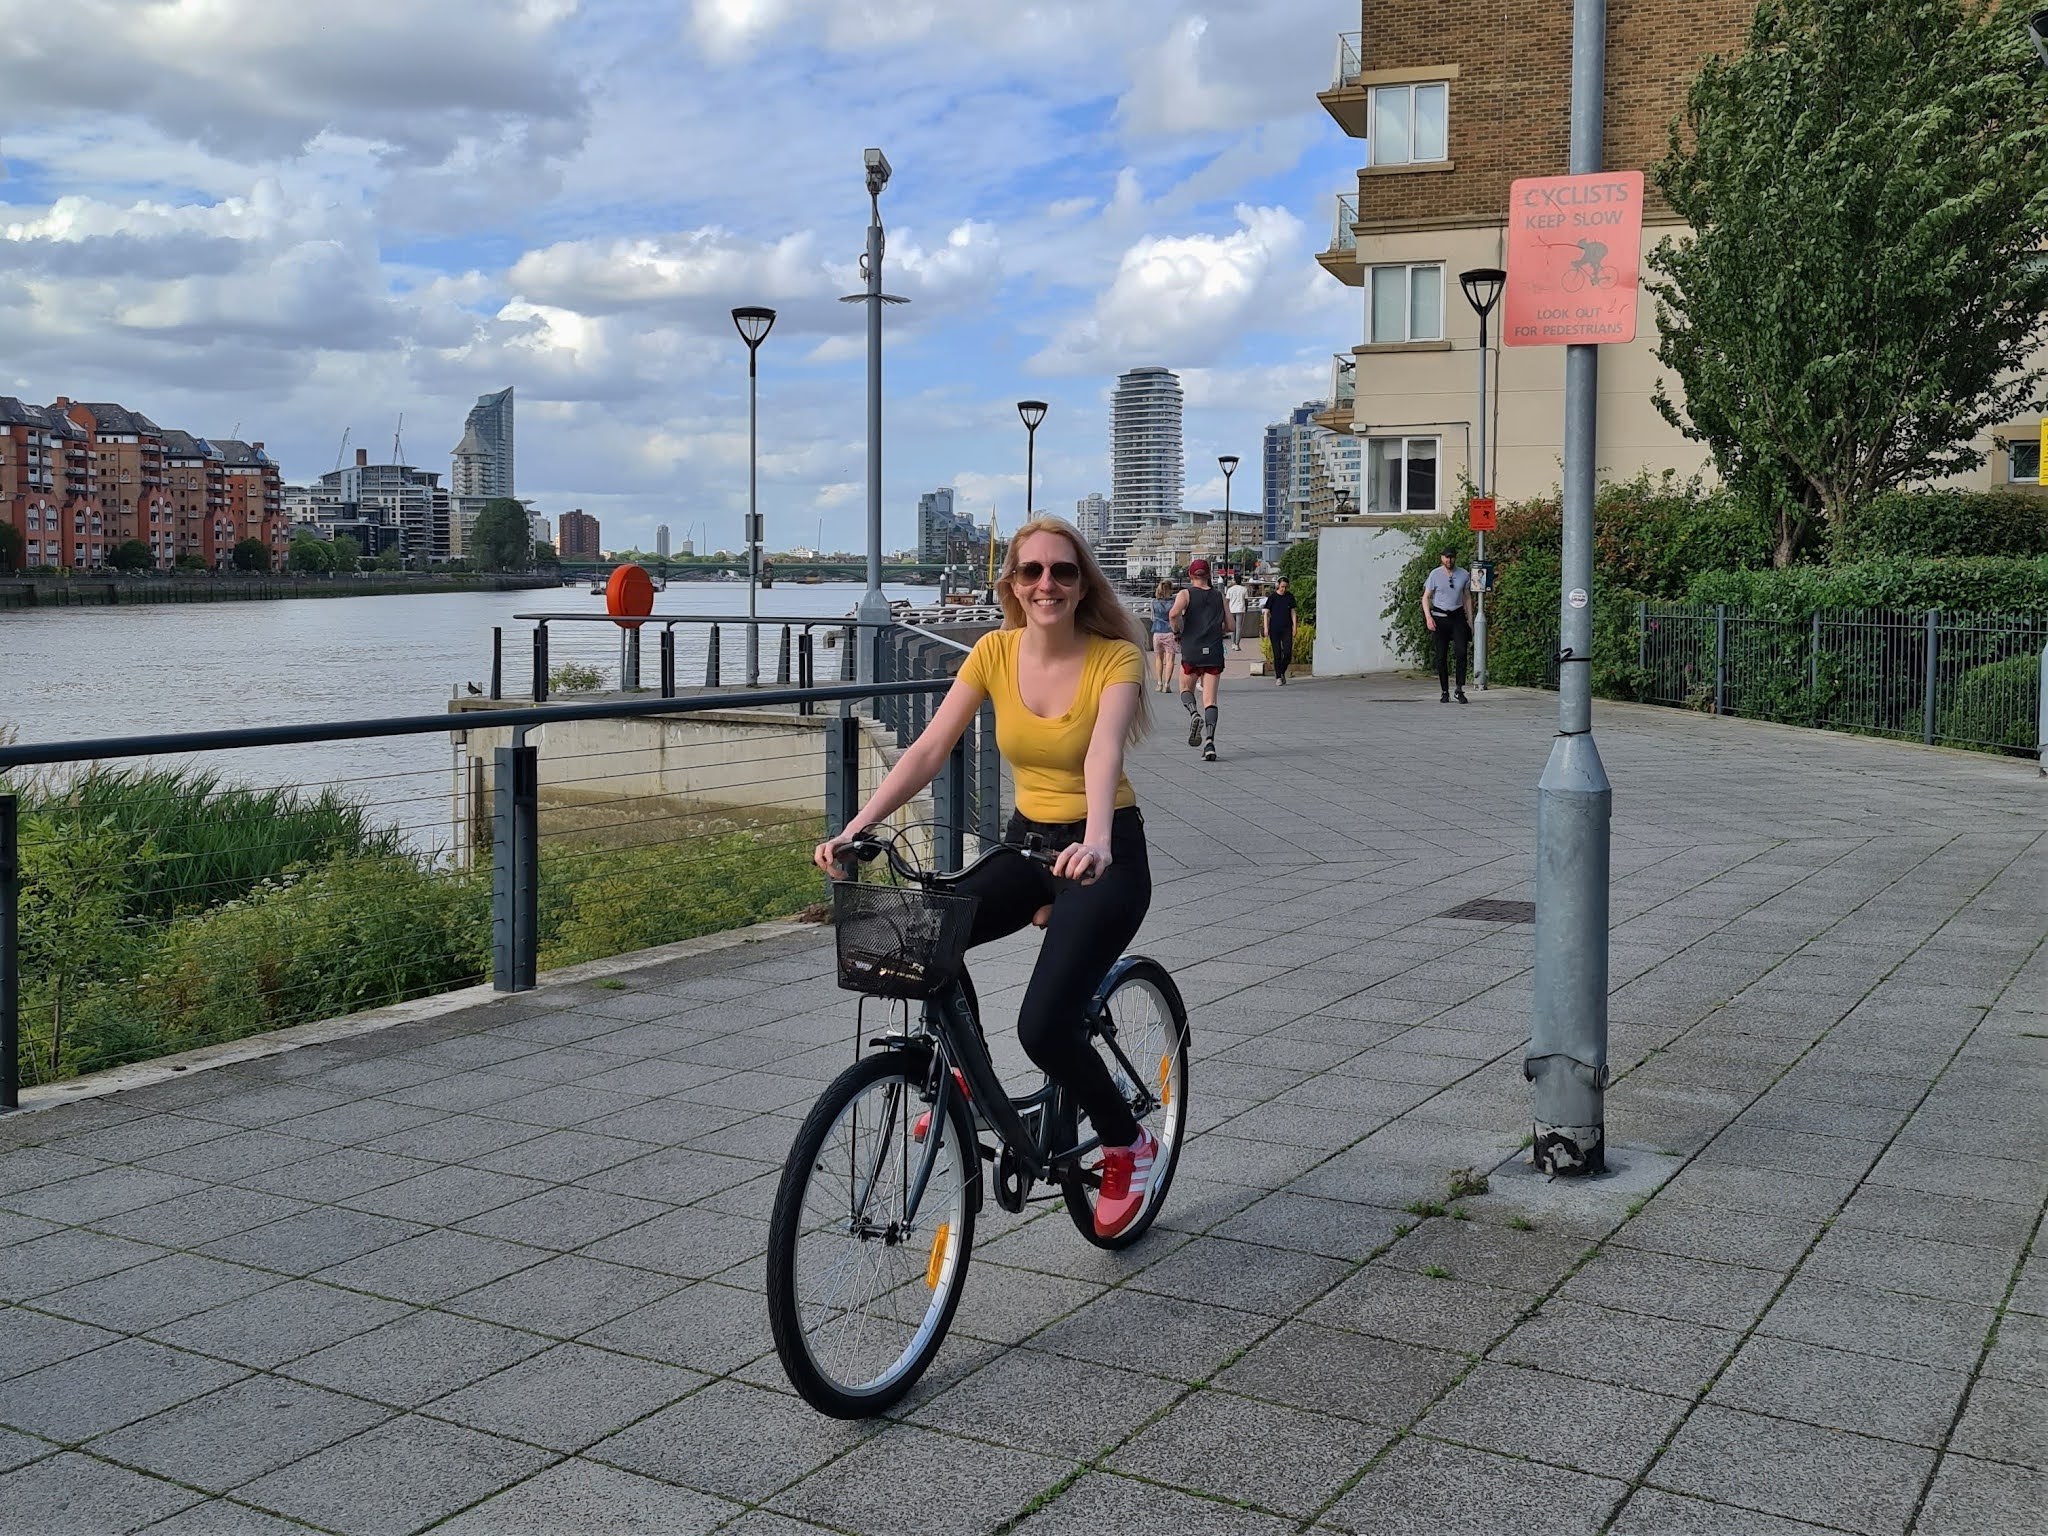 Thames cycle path, London